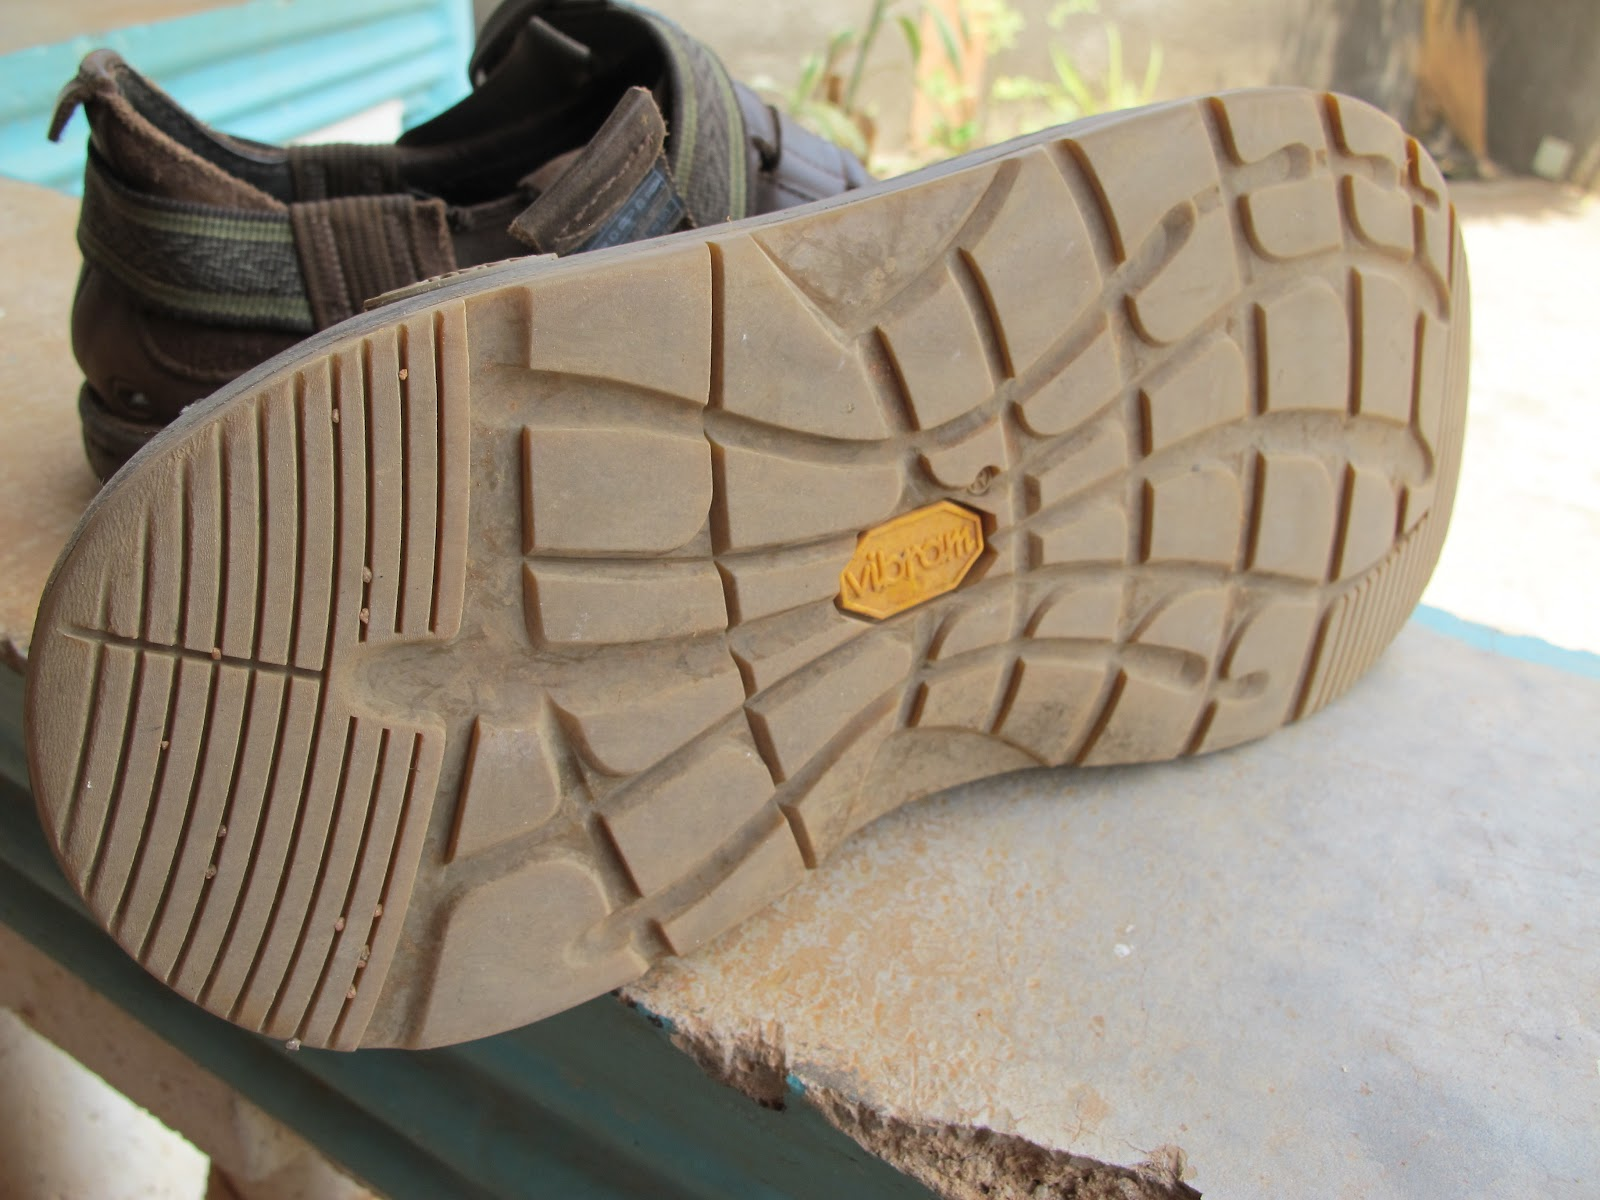 9b472ebb1540 Chacos Ecotread Flip and Flip Pro Flip-Flops - The Flip-Flop ...